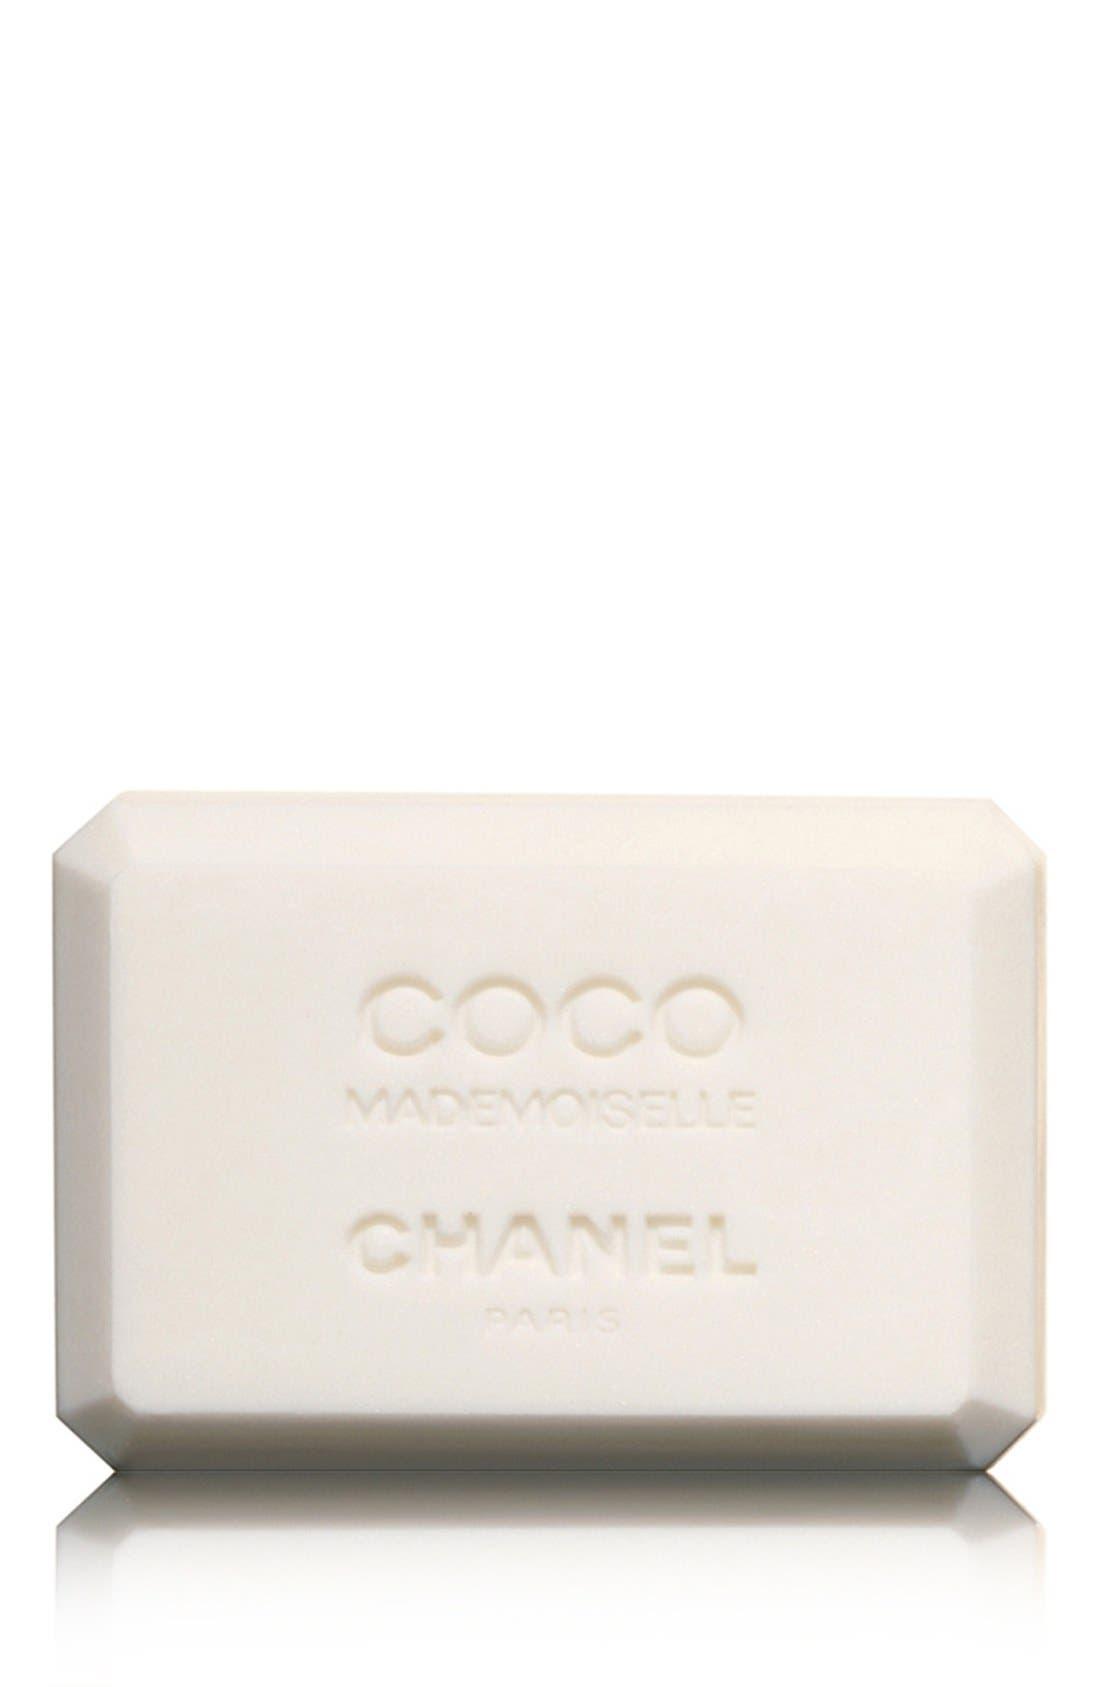 CHANEL COCO MADEMOISELLE Fresh Bath Soap | Nordstrom